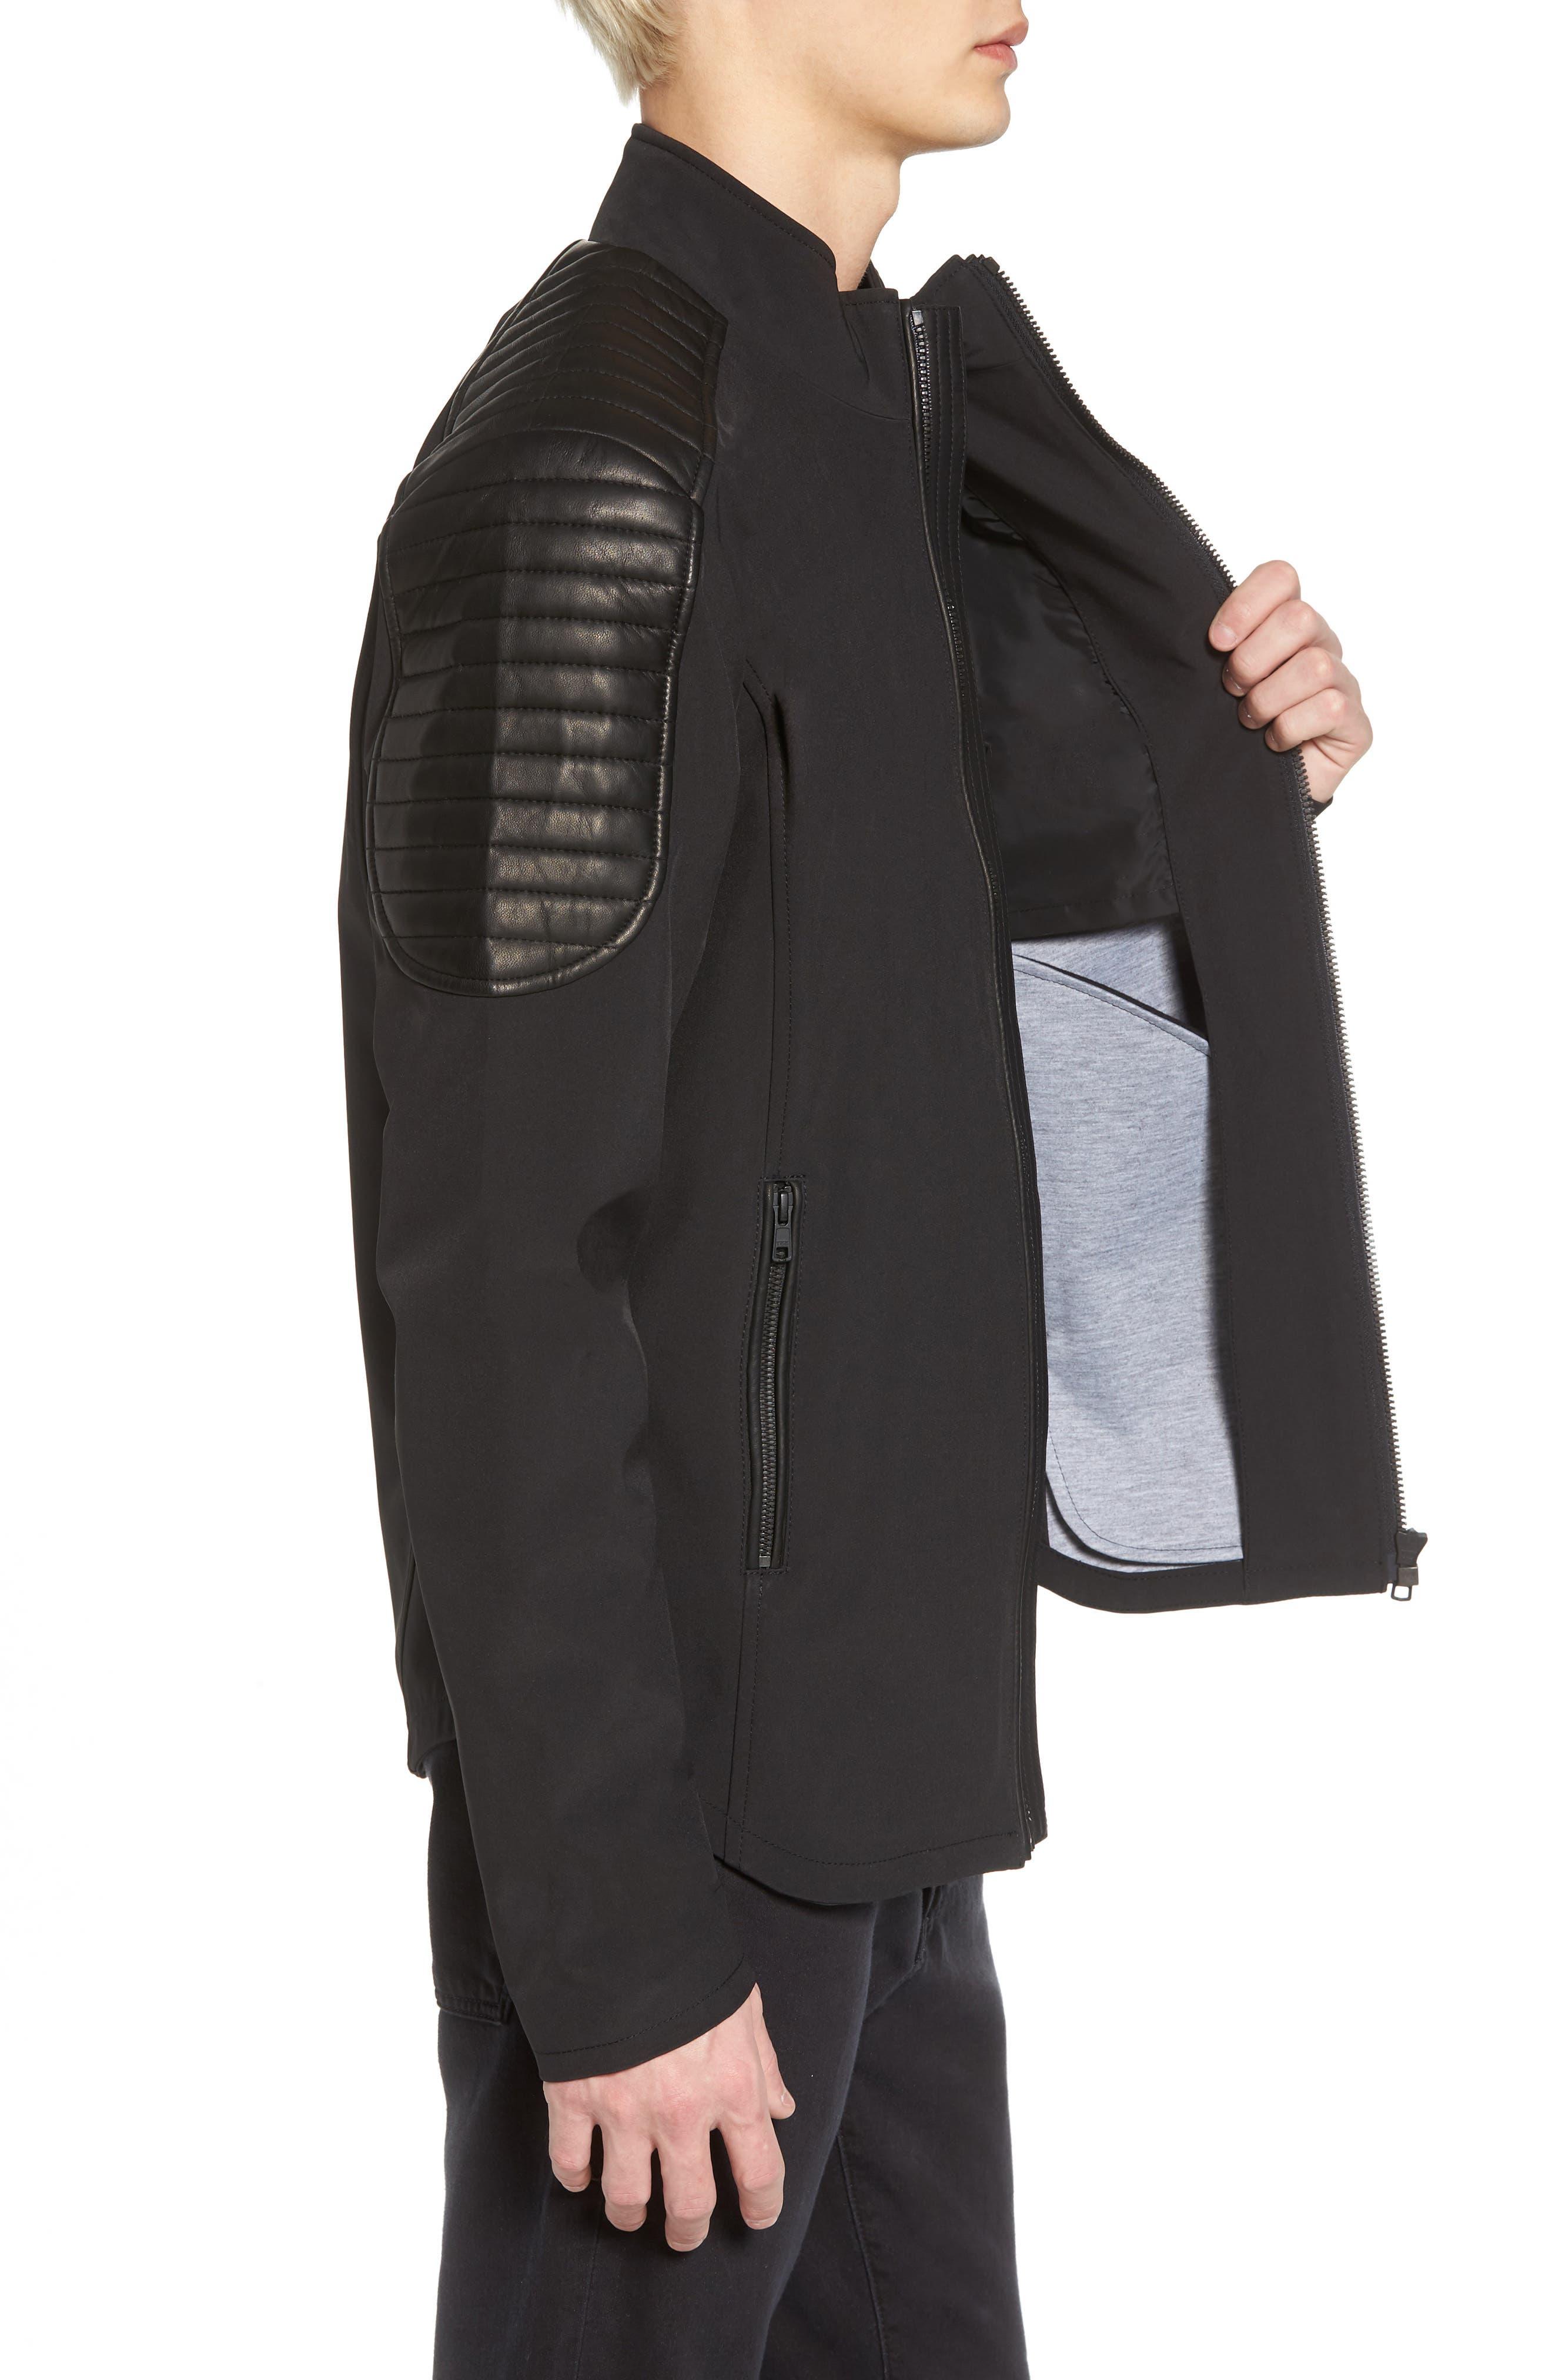 Grindstone Water Repellent Jacket,                             Alternate thumbnail 3, color,                             Black